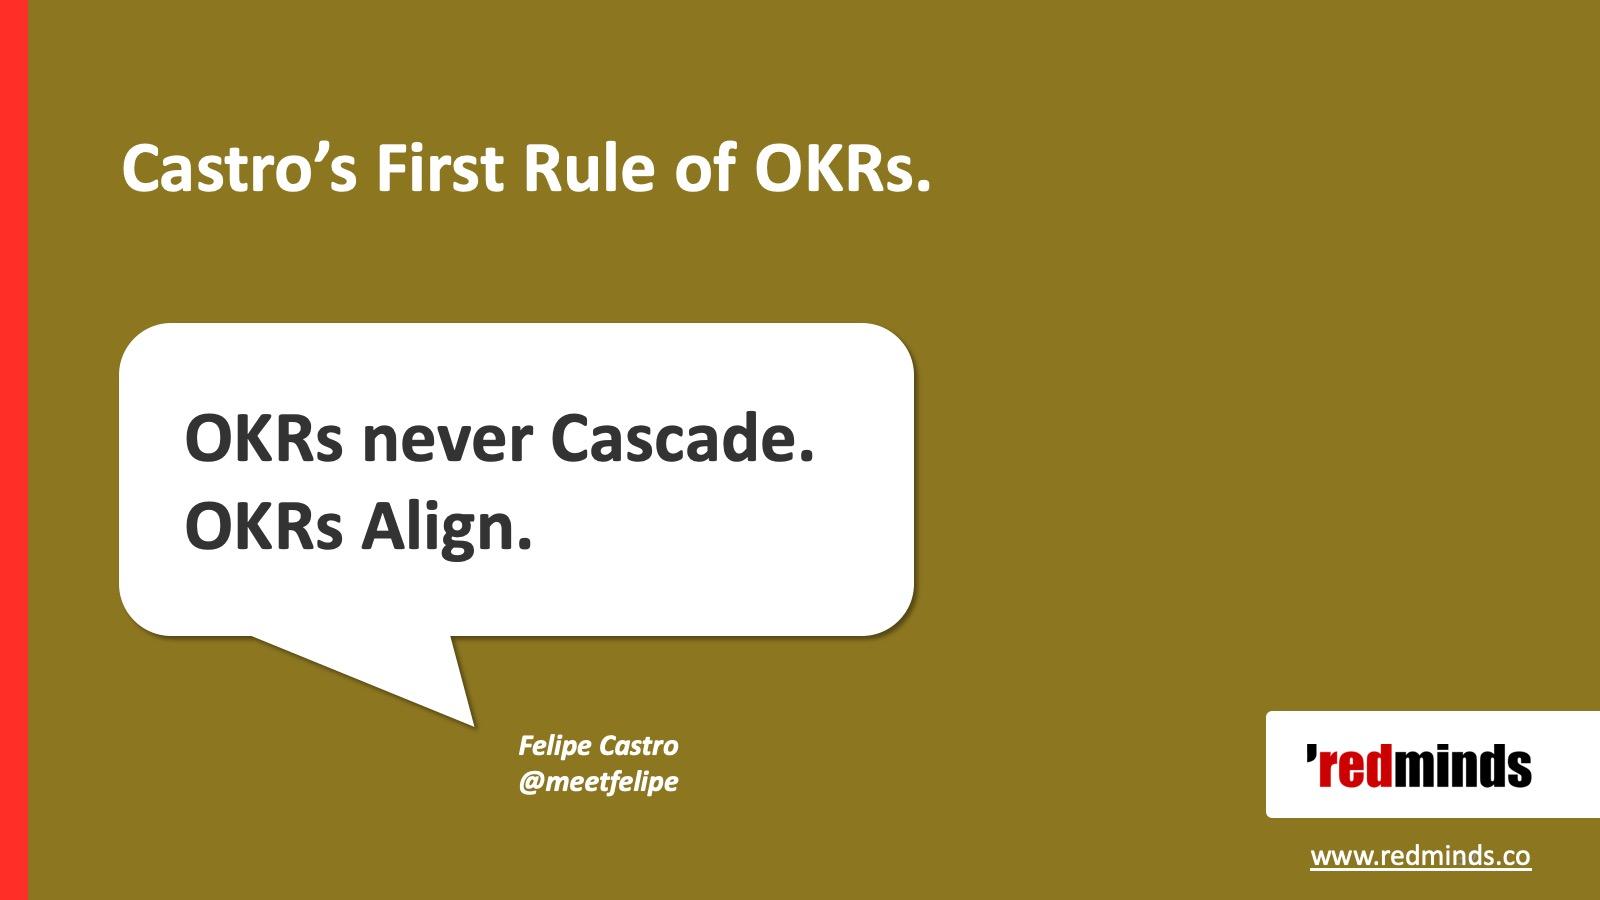 OKRs align.